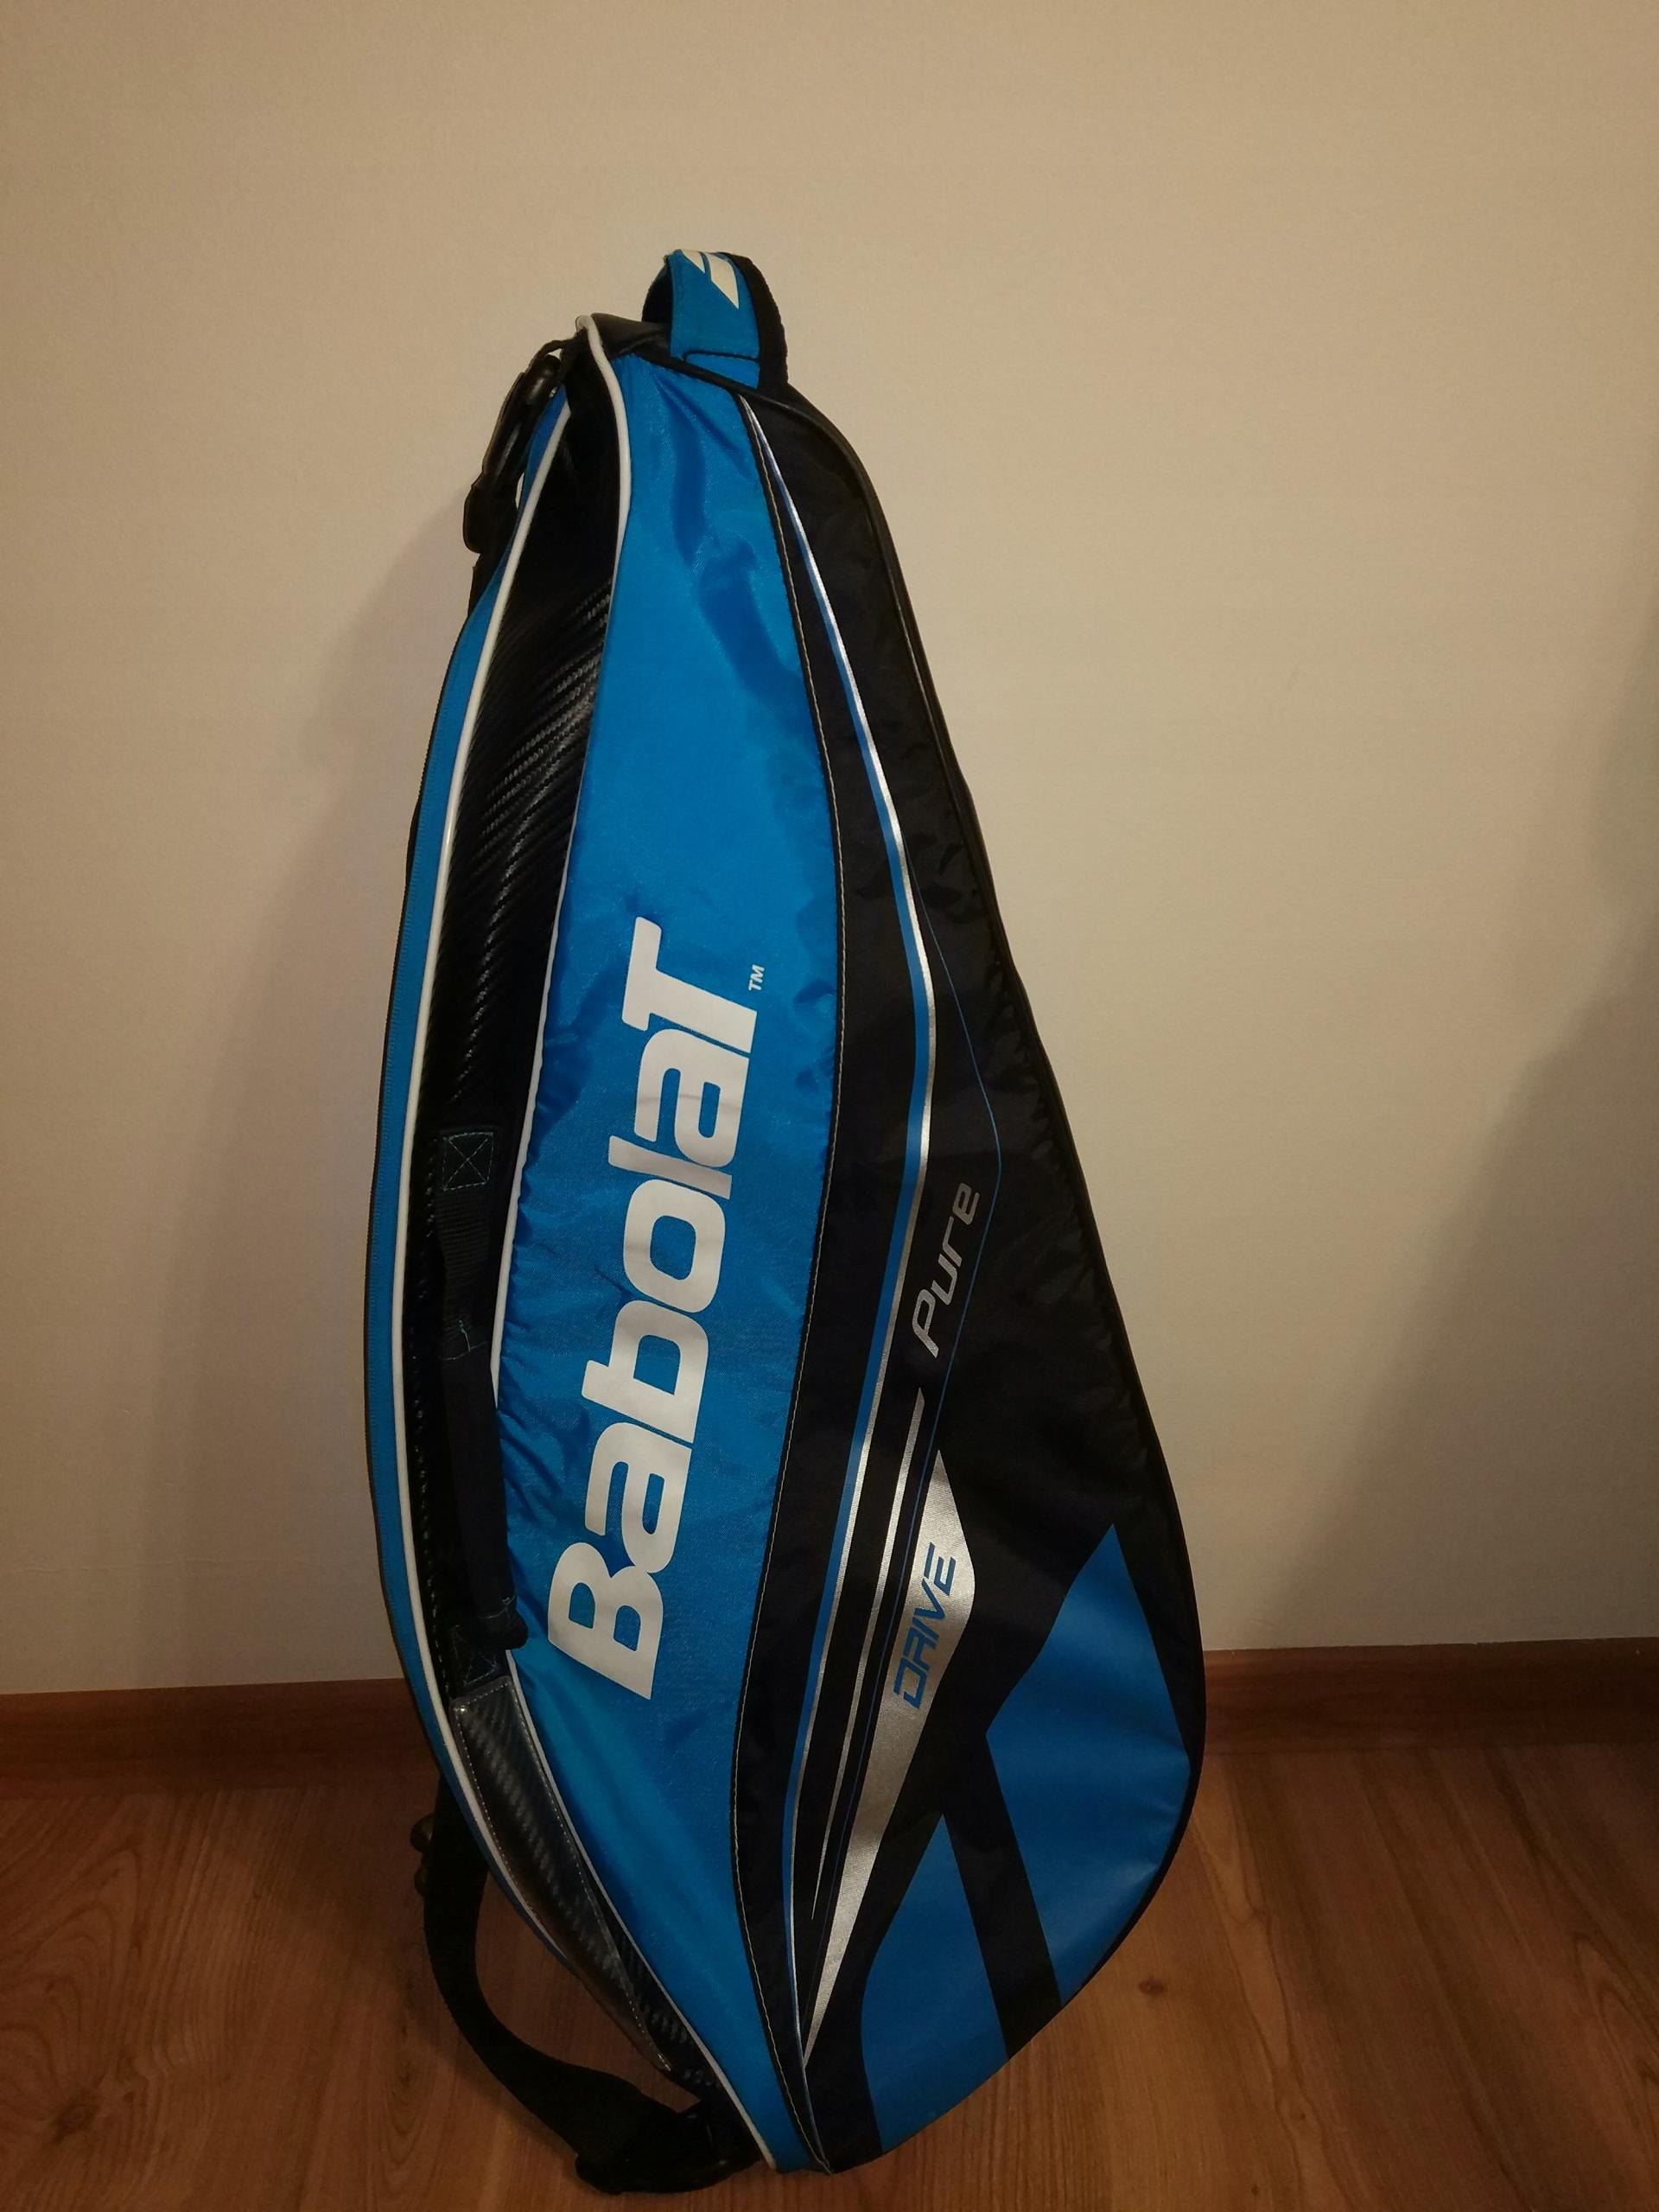 Torba tenisowa Babolat Thermobag x3 Pure Drive